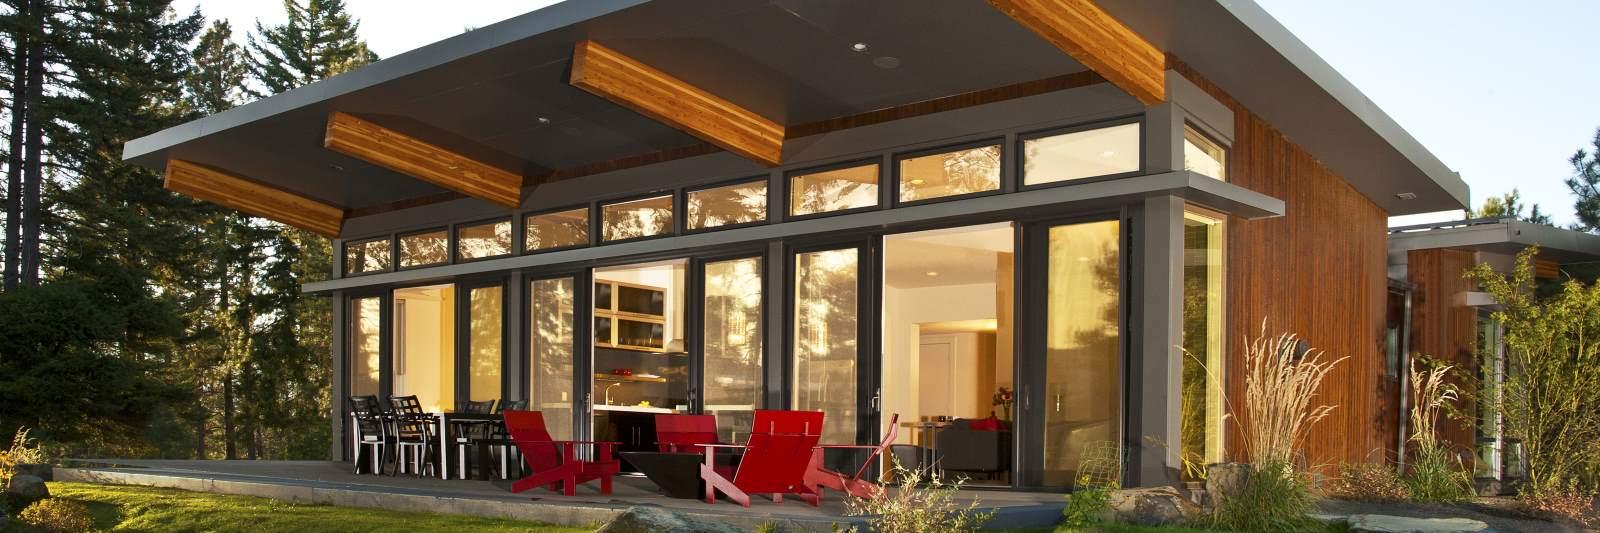 Can You Design Your Own Prefab Home   Stillwater Dwellings Modern Prefab  Homes